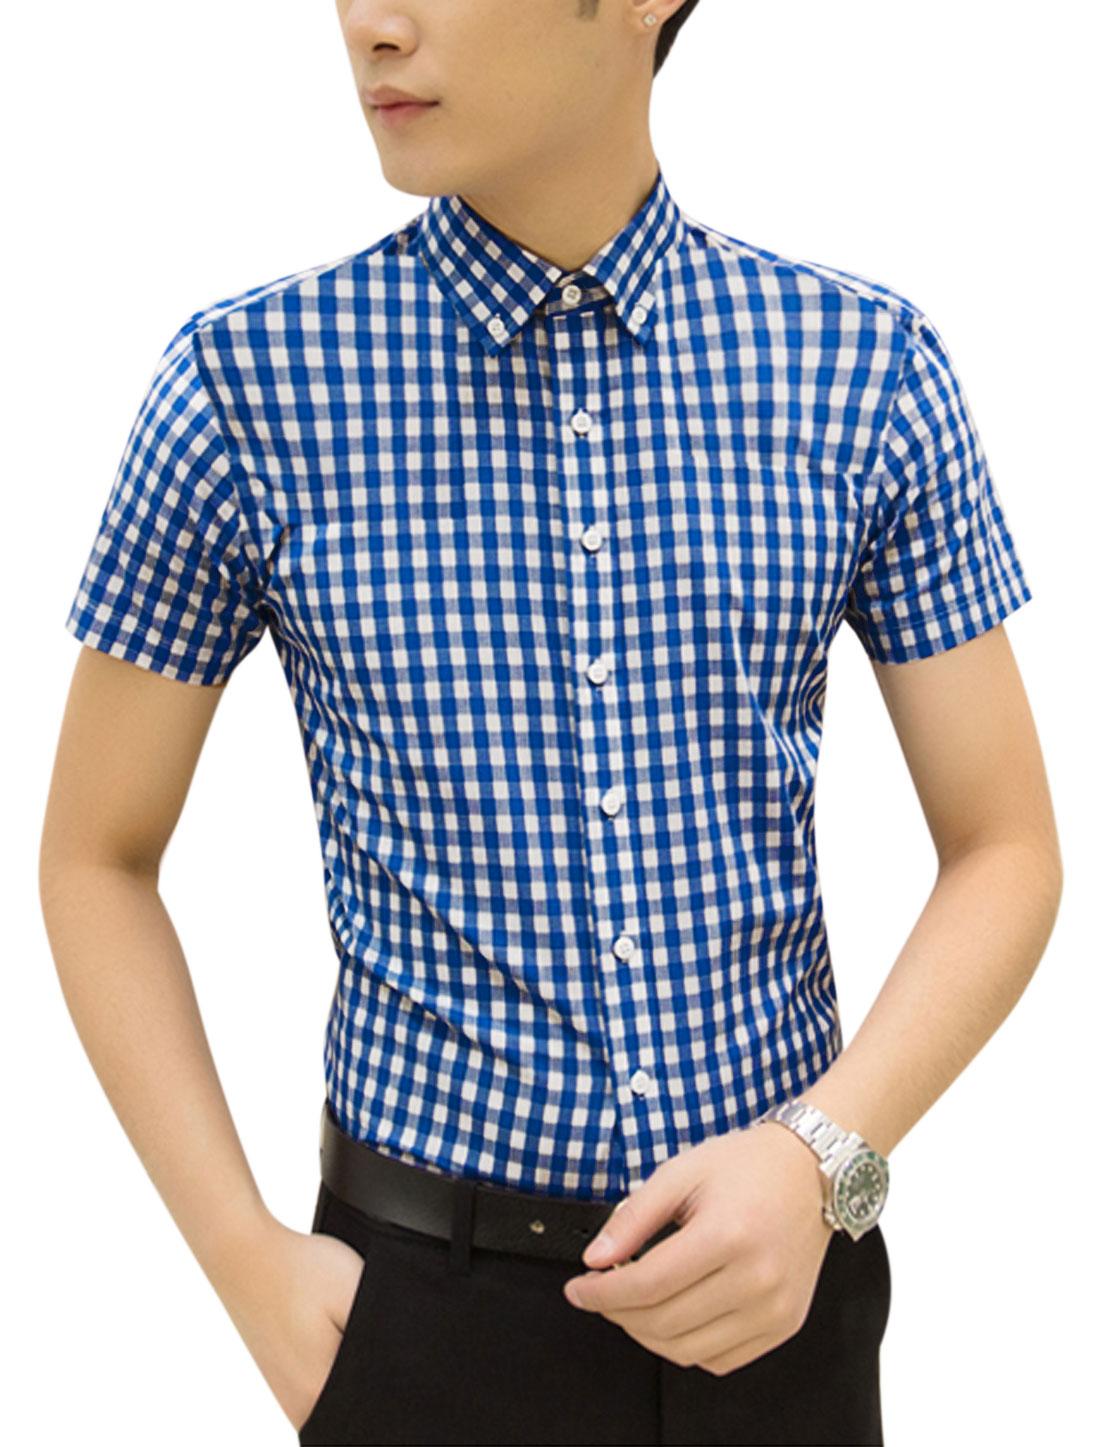 Men Plaids Short Sleeves Button Closure Casual Shirts Dark Blue White M